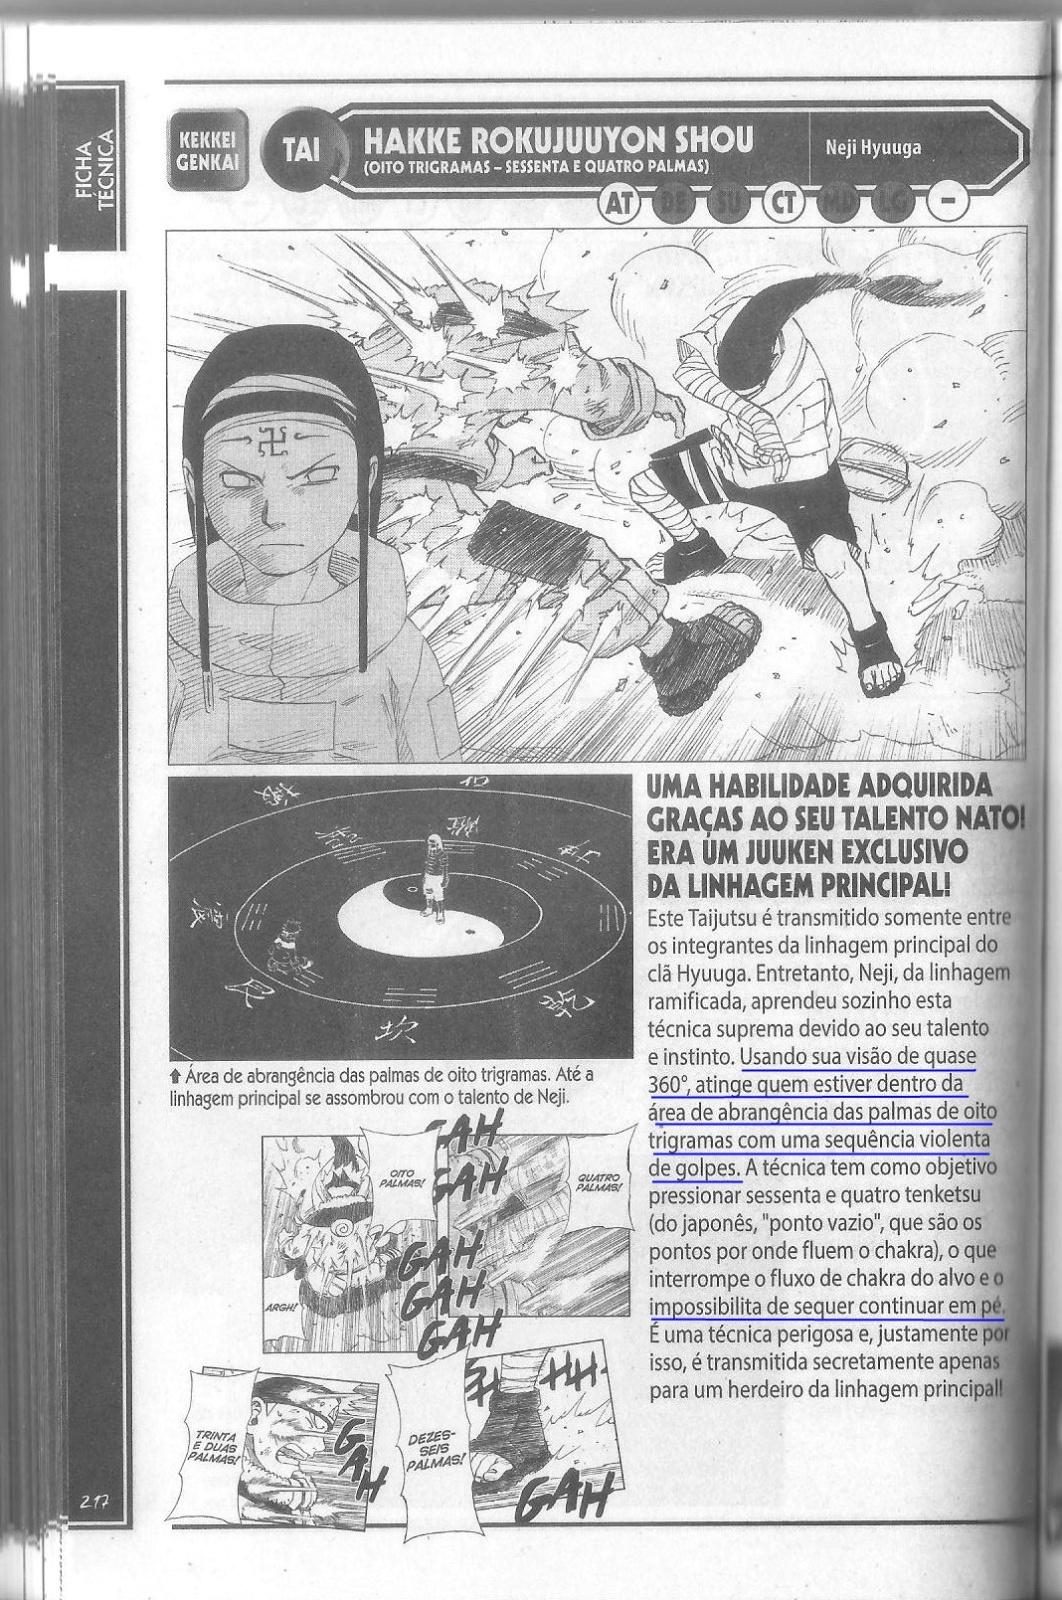 Hidan vs Jūken. Quem vence? - Página 2 10r69s7